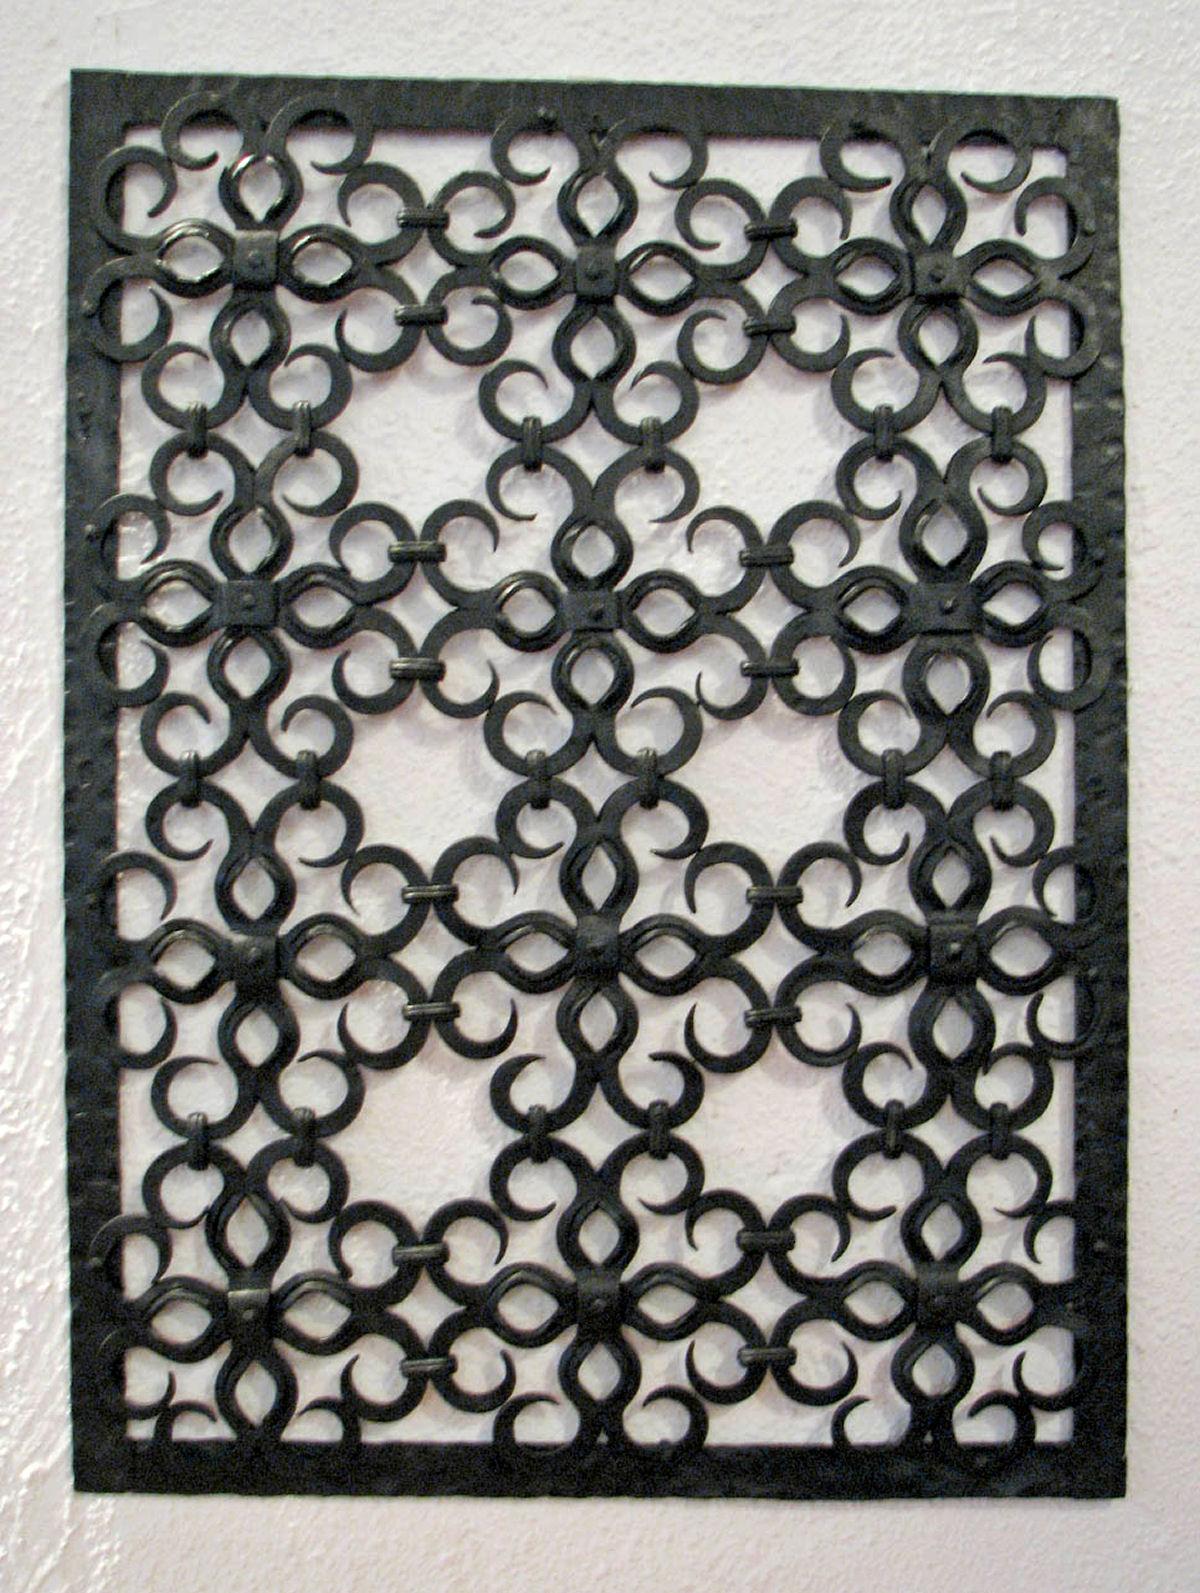 kropa-iron-forging-ironwork-02-museum